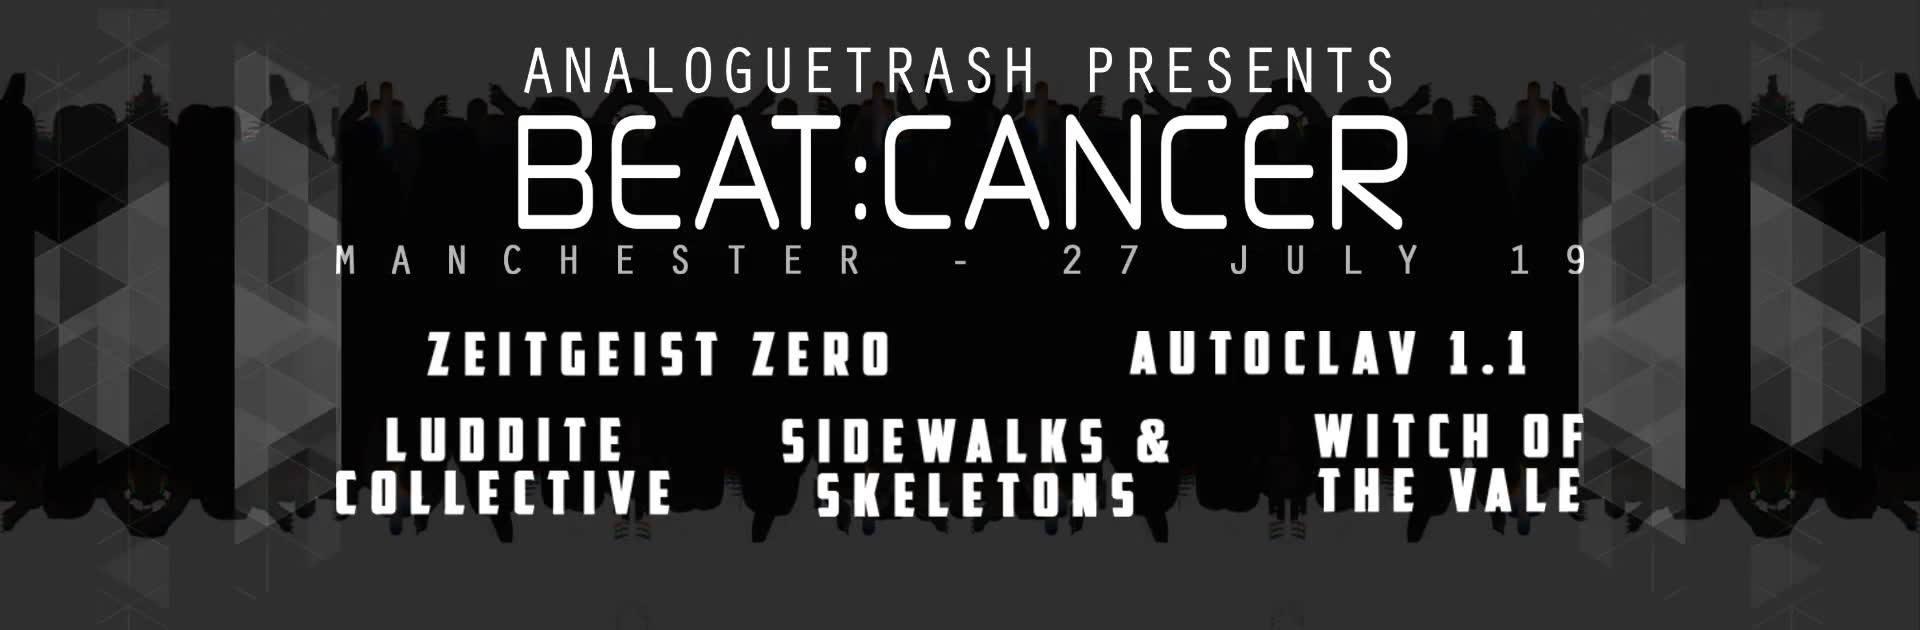 Beat:Cancer Manchester - Zeitgeist Zero, Autoclav 1.1, Sidewalks & Skeletons, WItch of The Vale & Luddite Collective